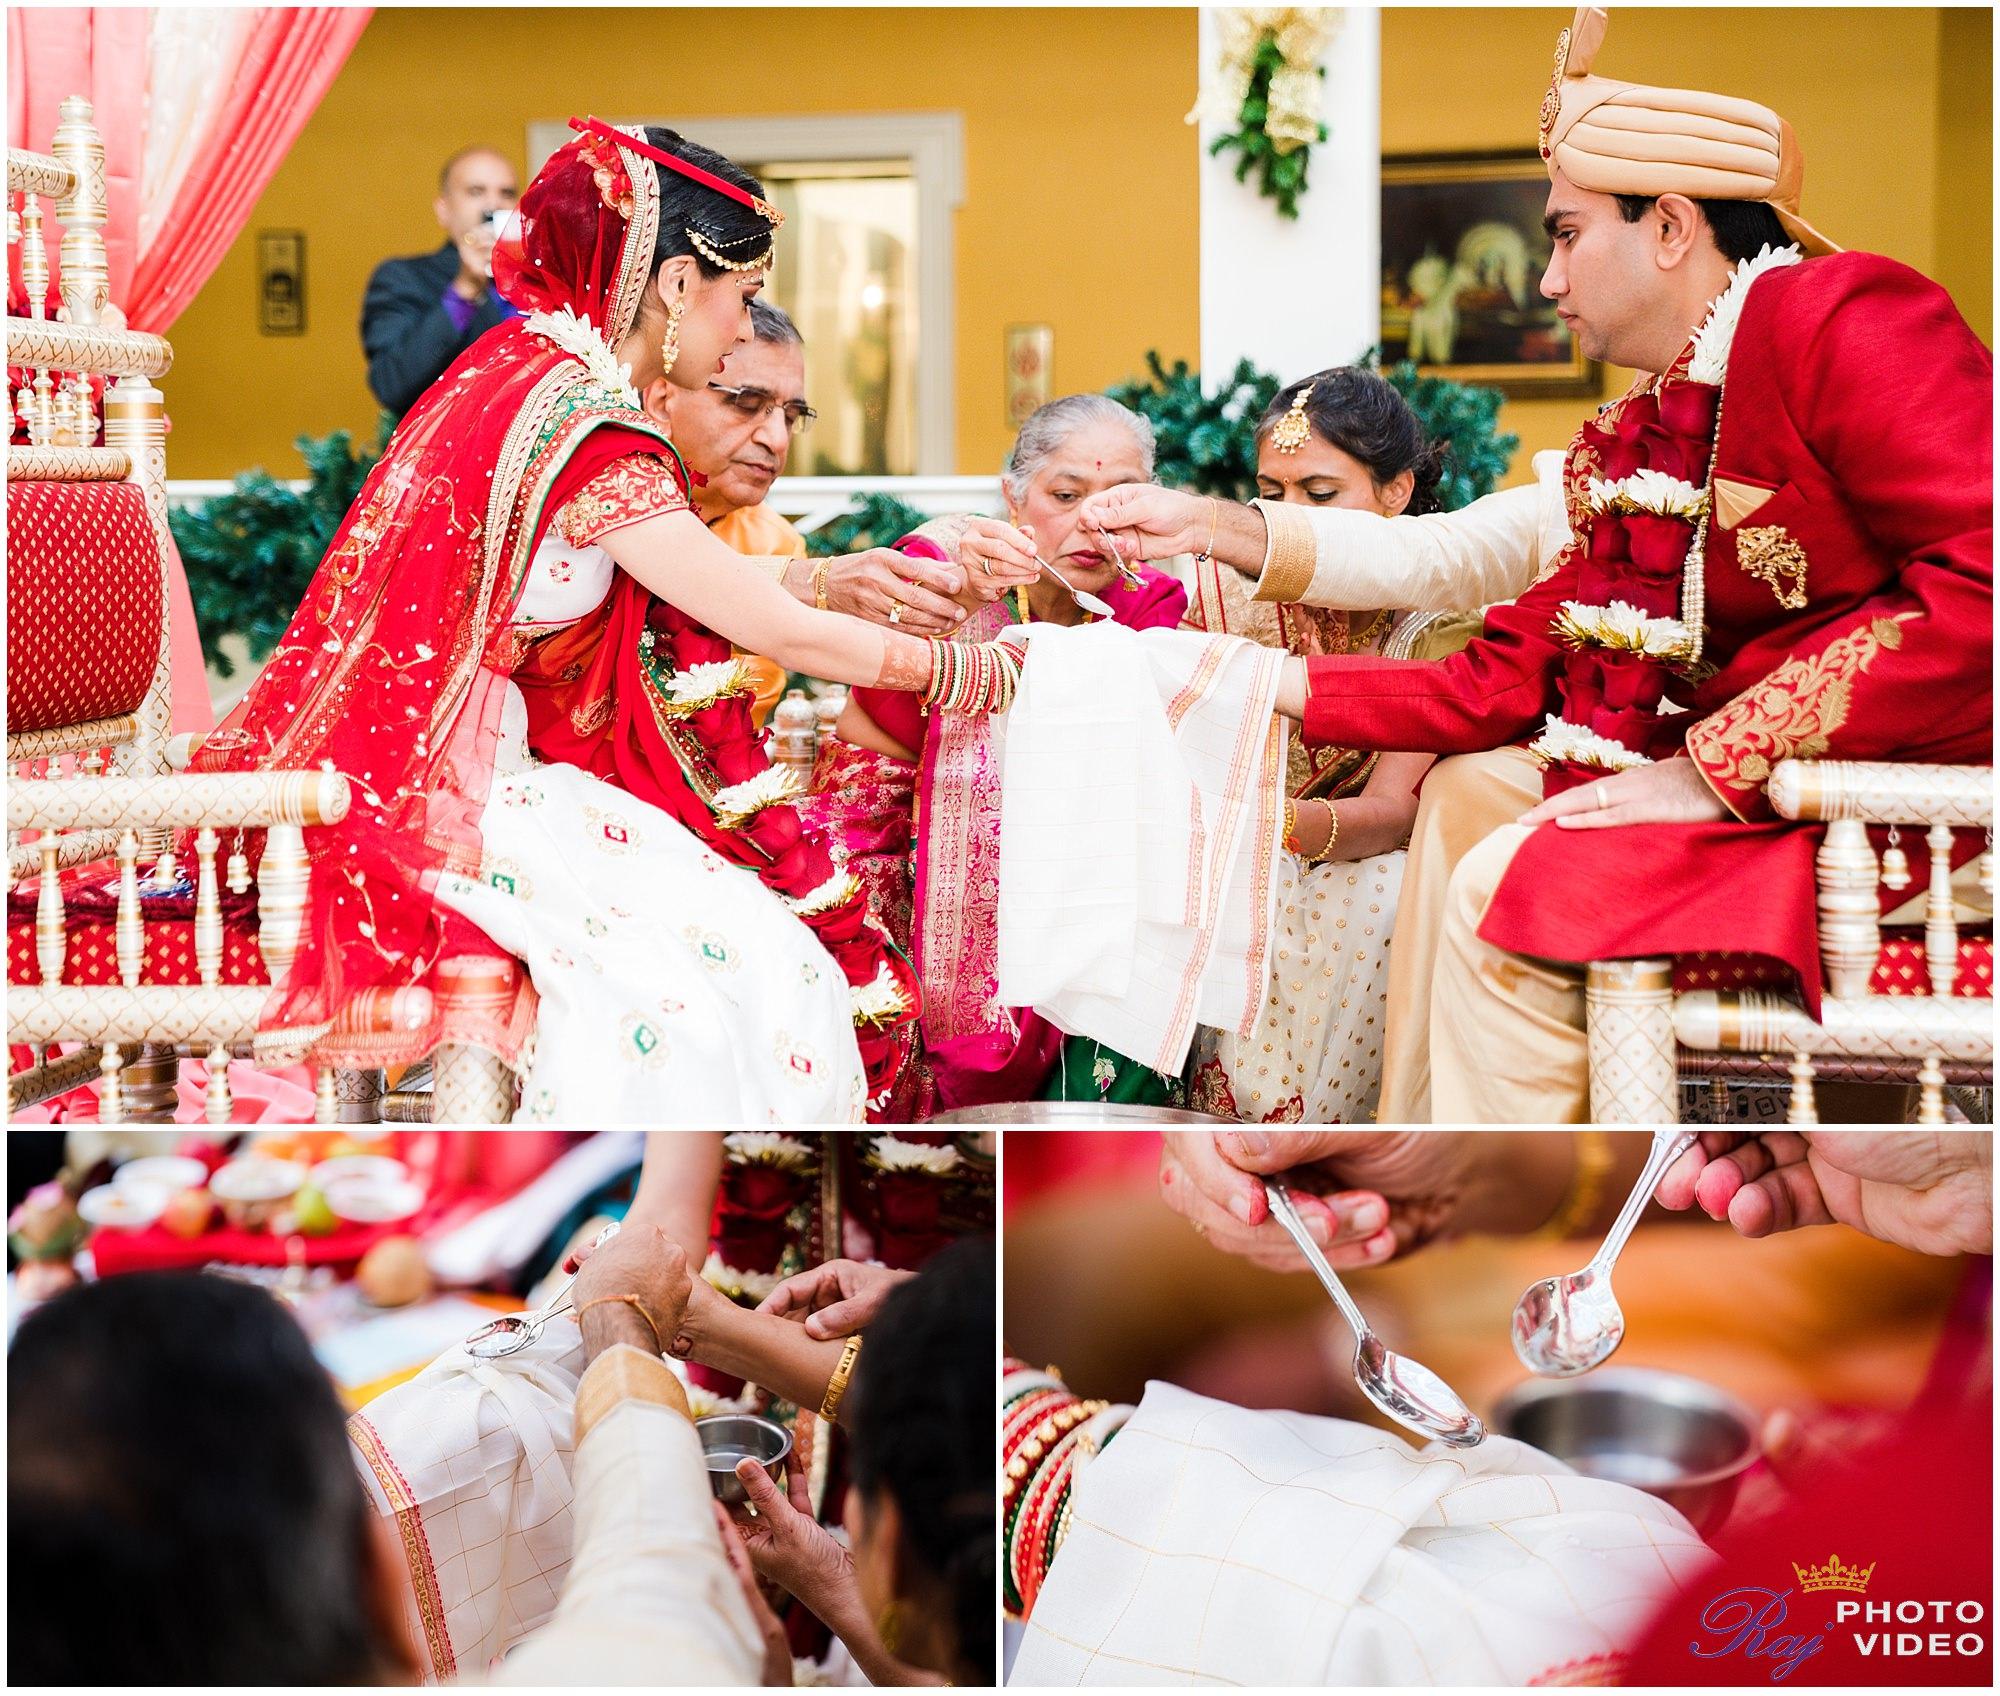 Founders-Inn-and-Spa-Virginia-Beach-VA-Indian-Wedding-Harini-Vivek-38.jpg